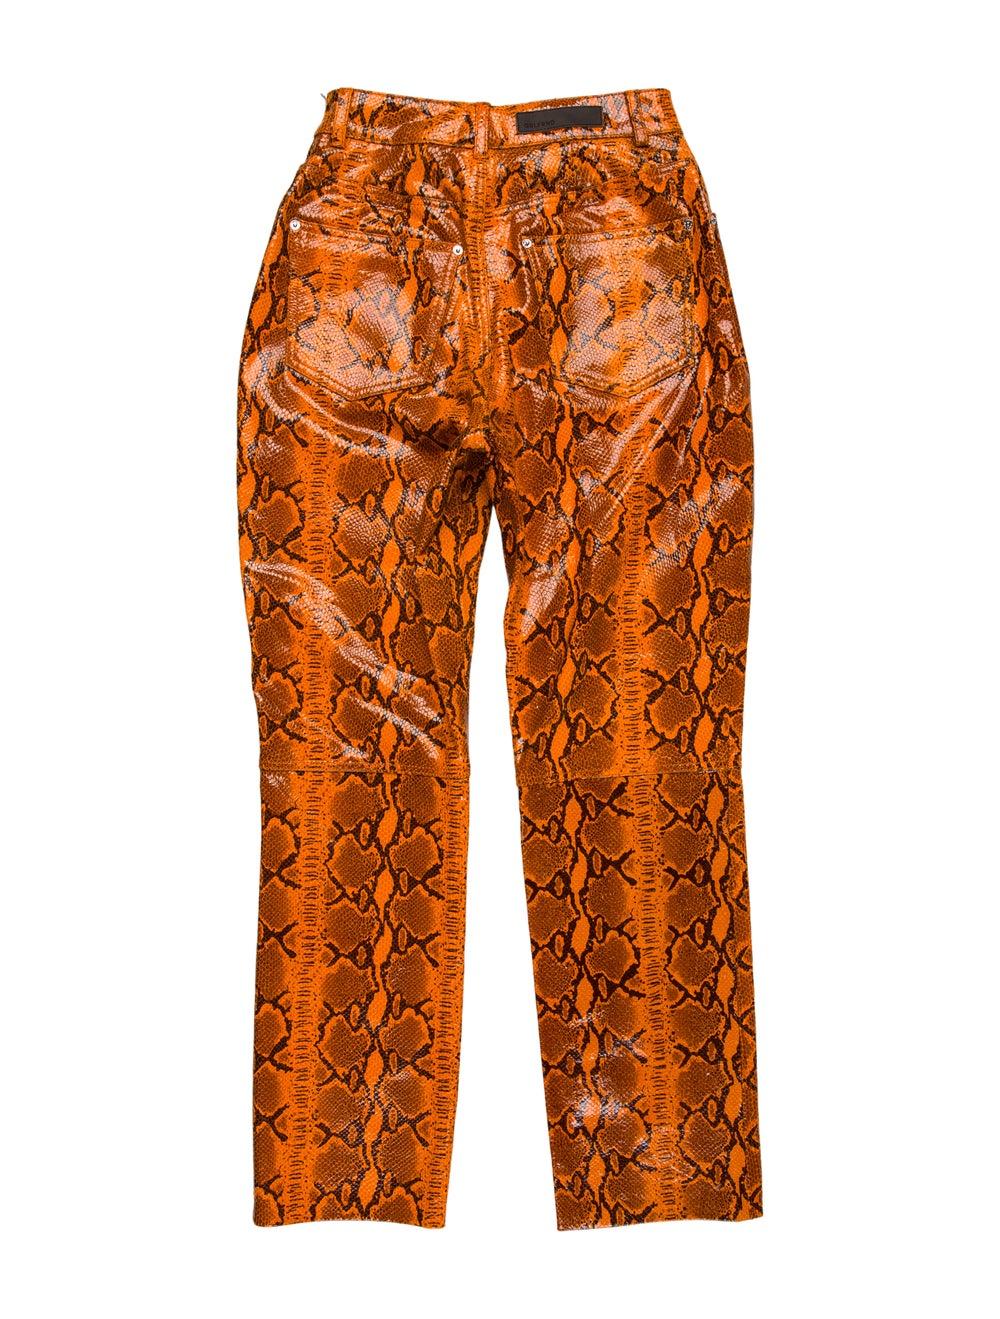 Grlfrnd Animal Print Straight Leg Pants Orange - image 2